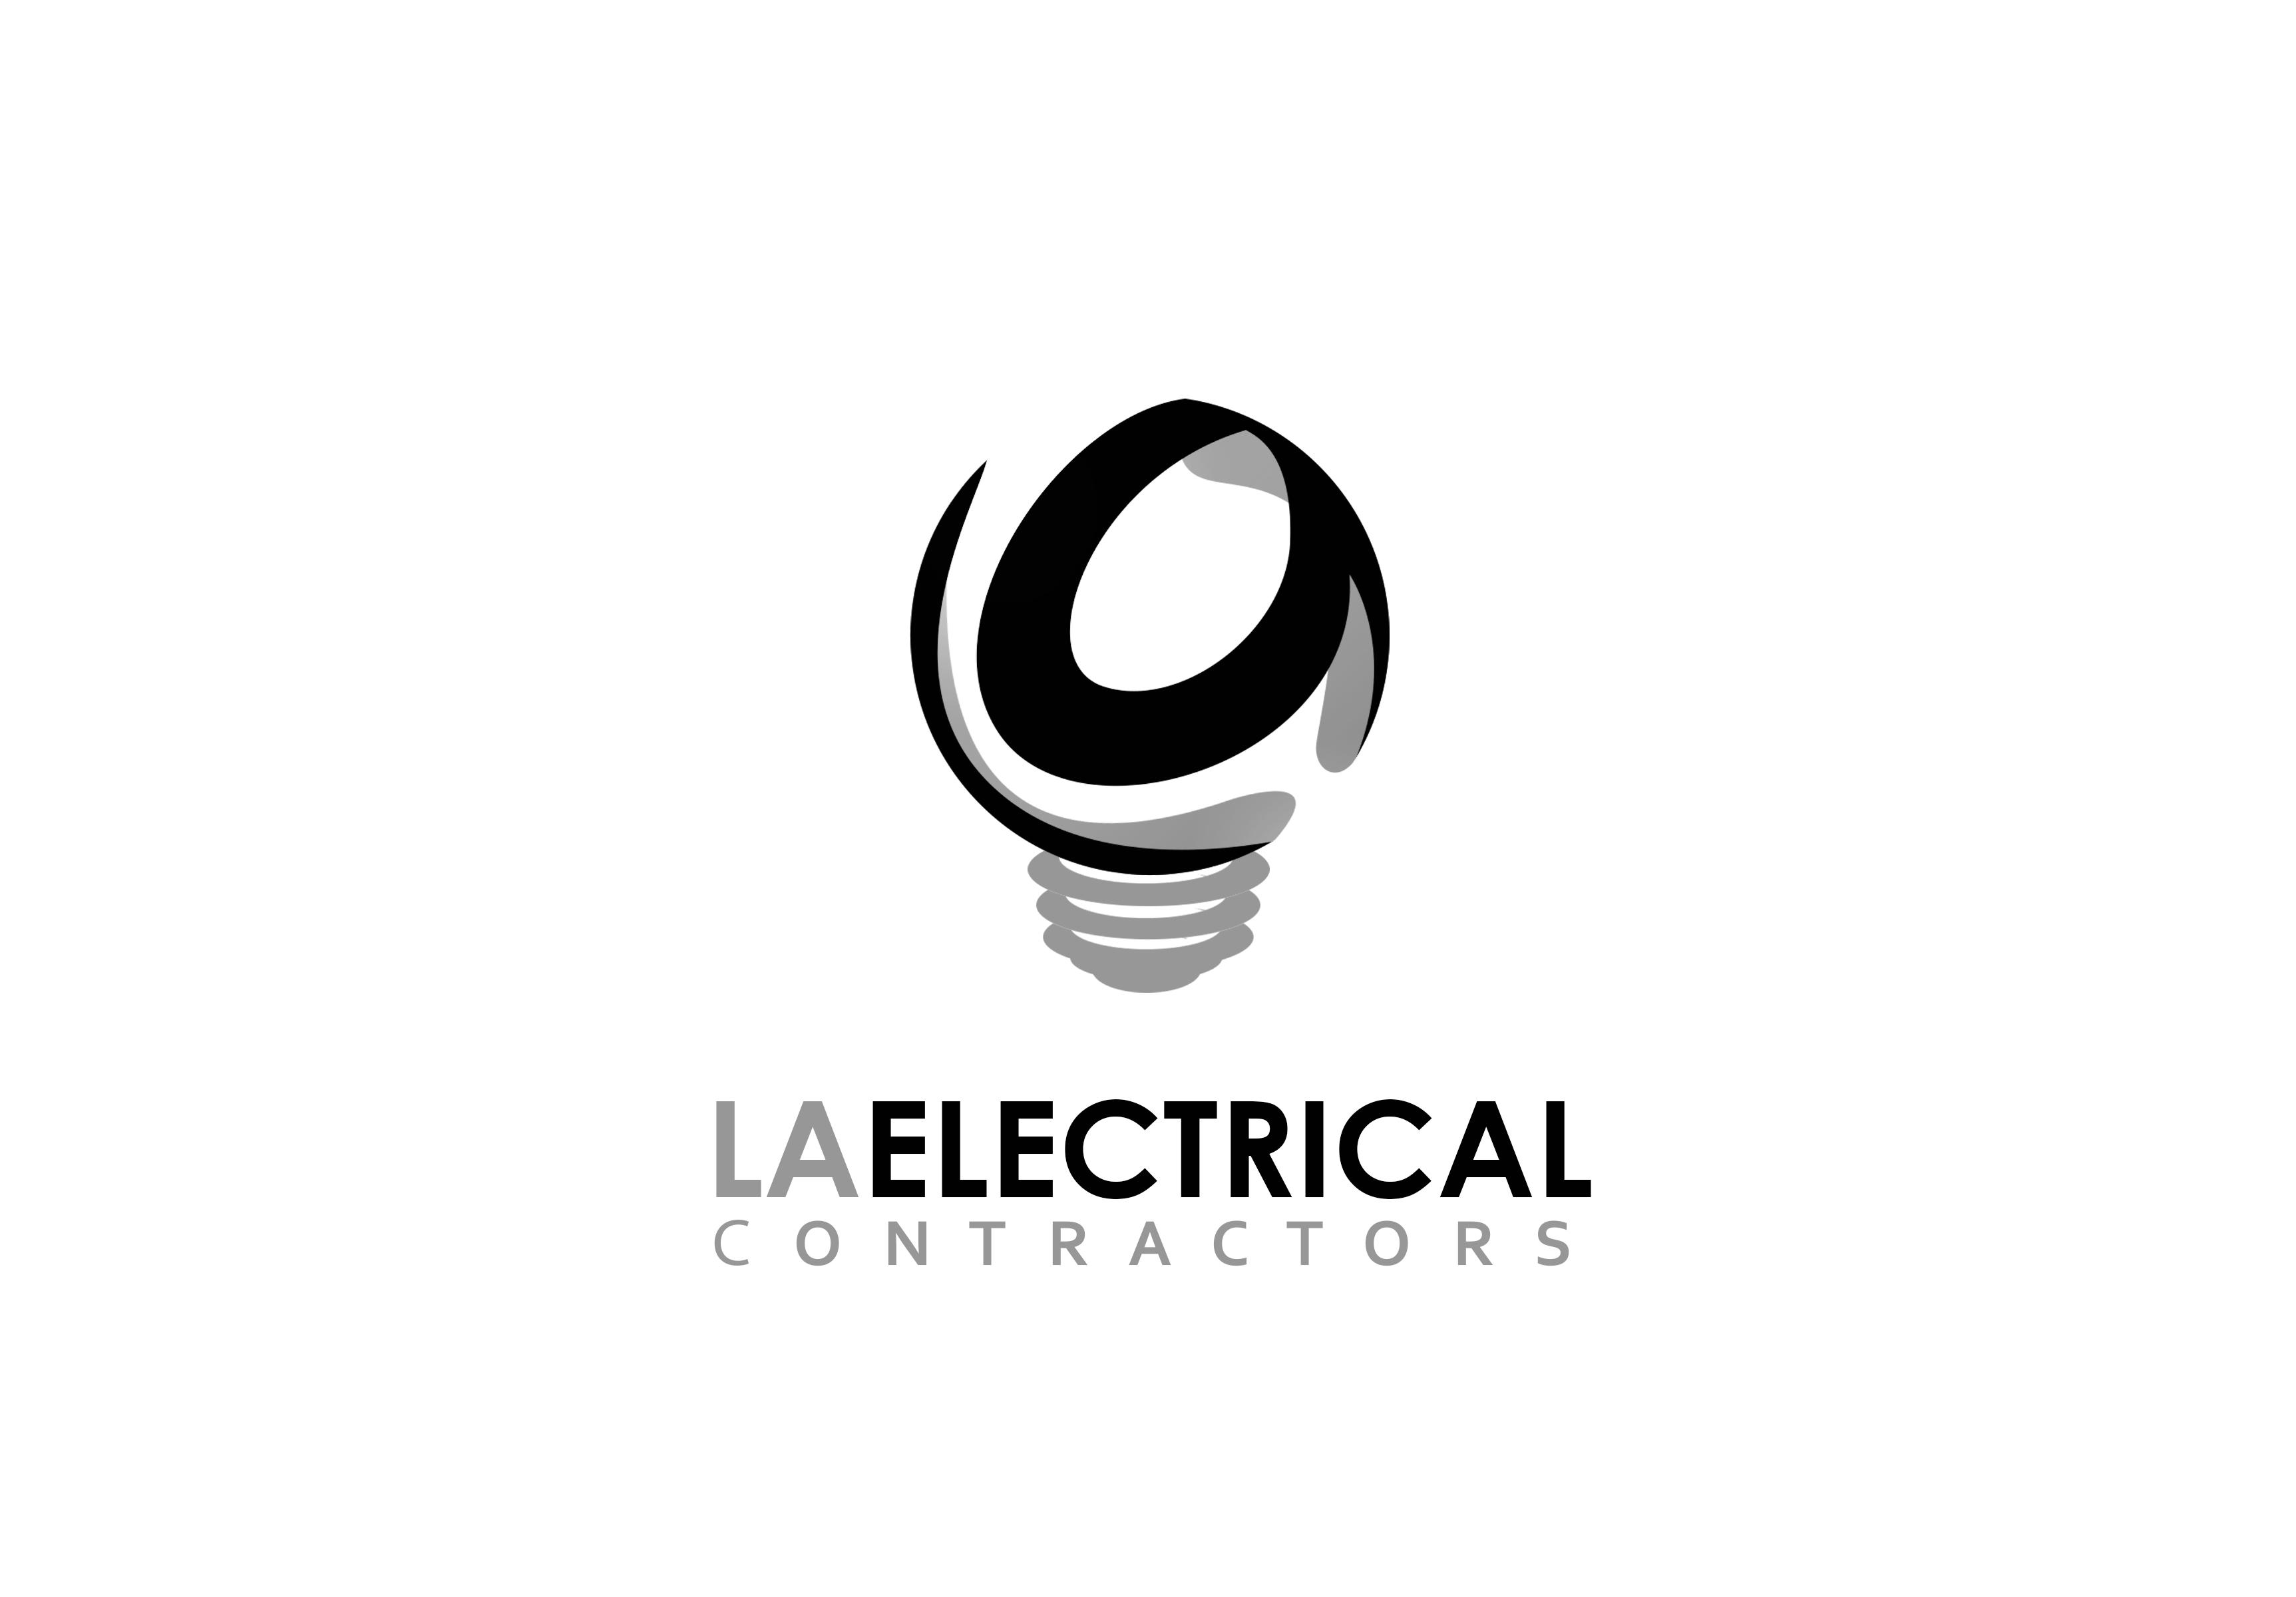 L A Electrical Contractors Verified Logo